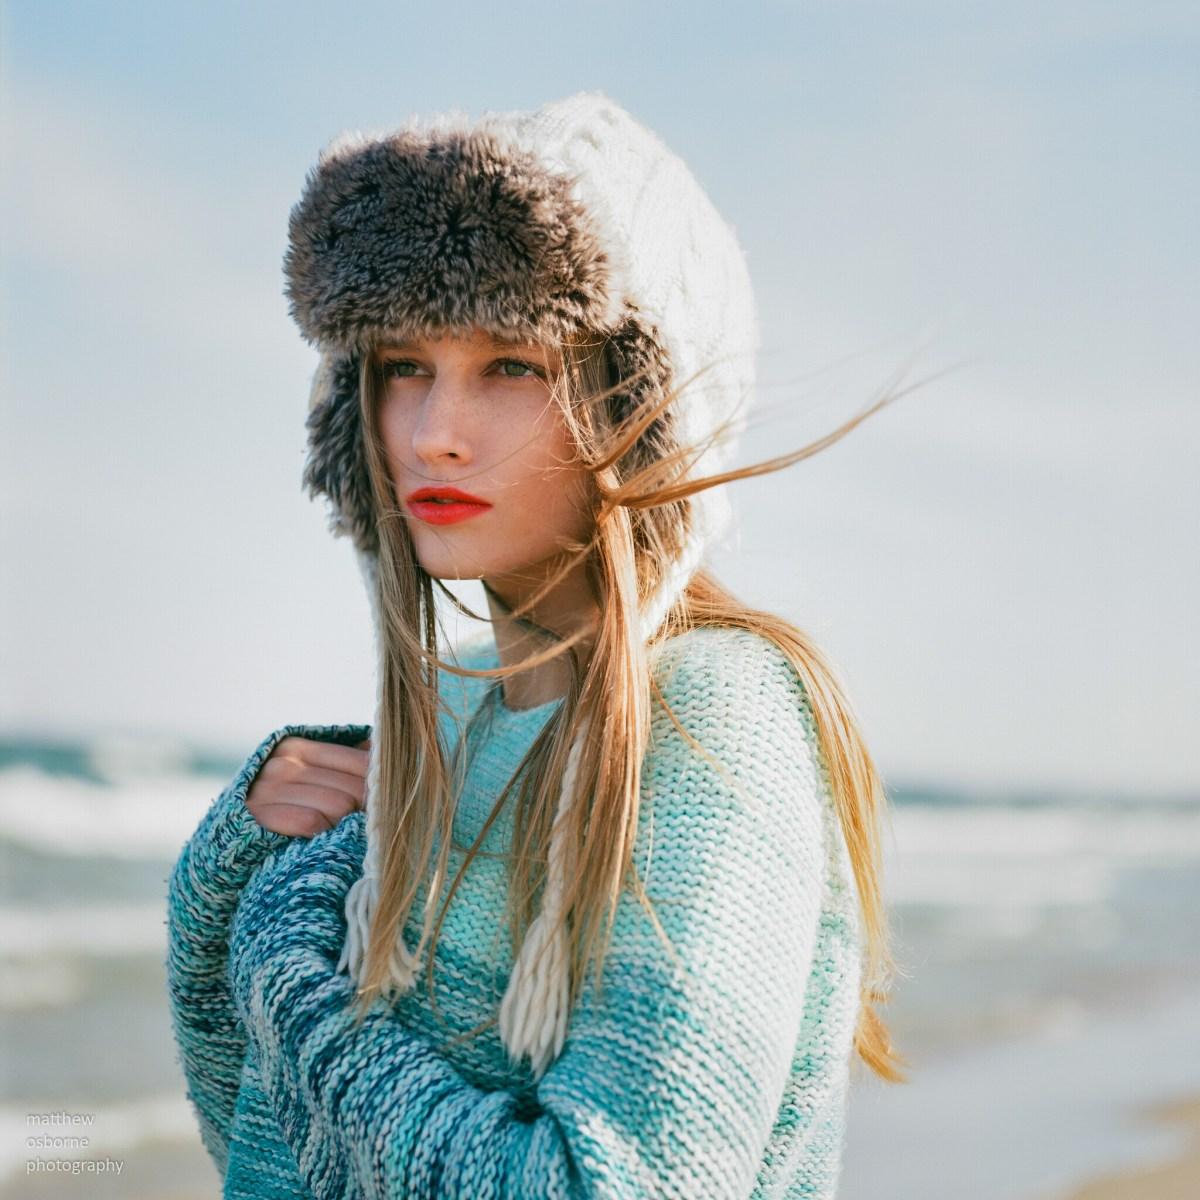 Hasselblad Fashion / Ektar – Poland